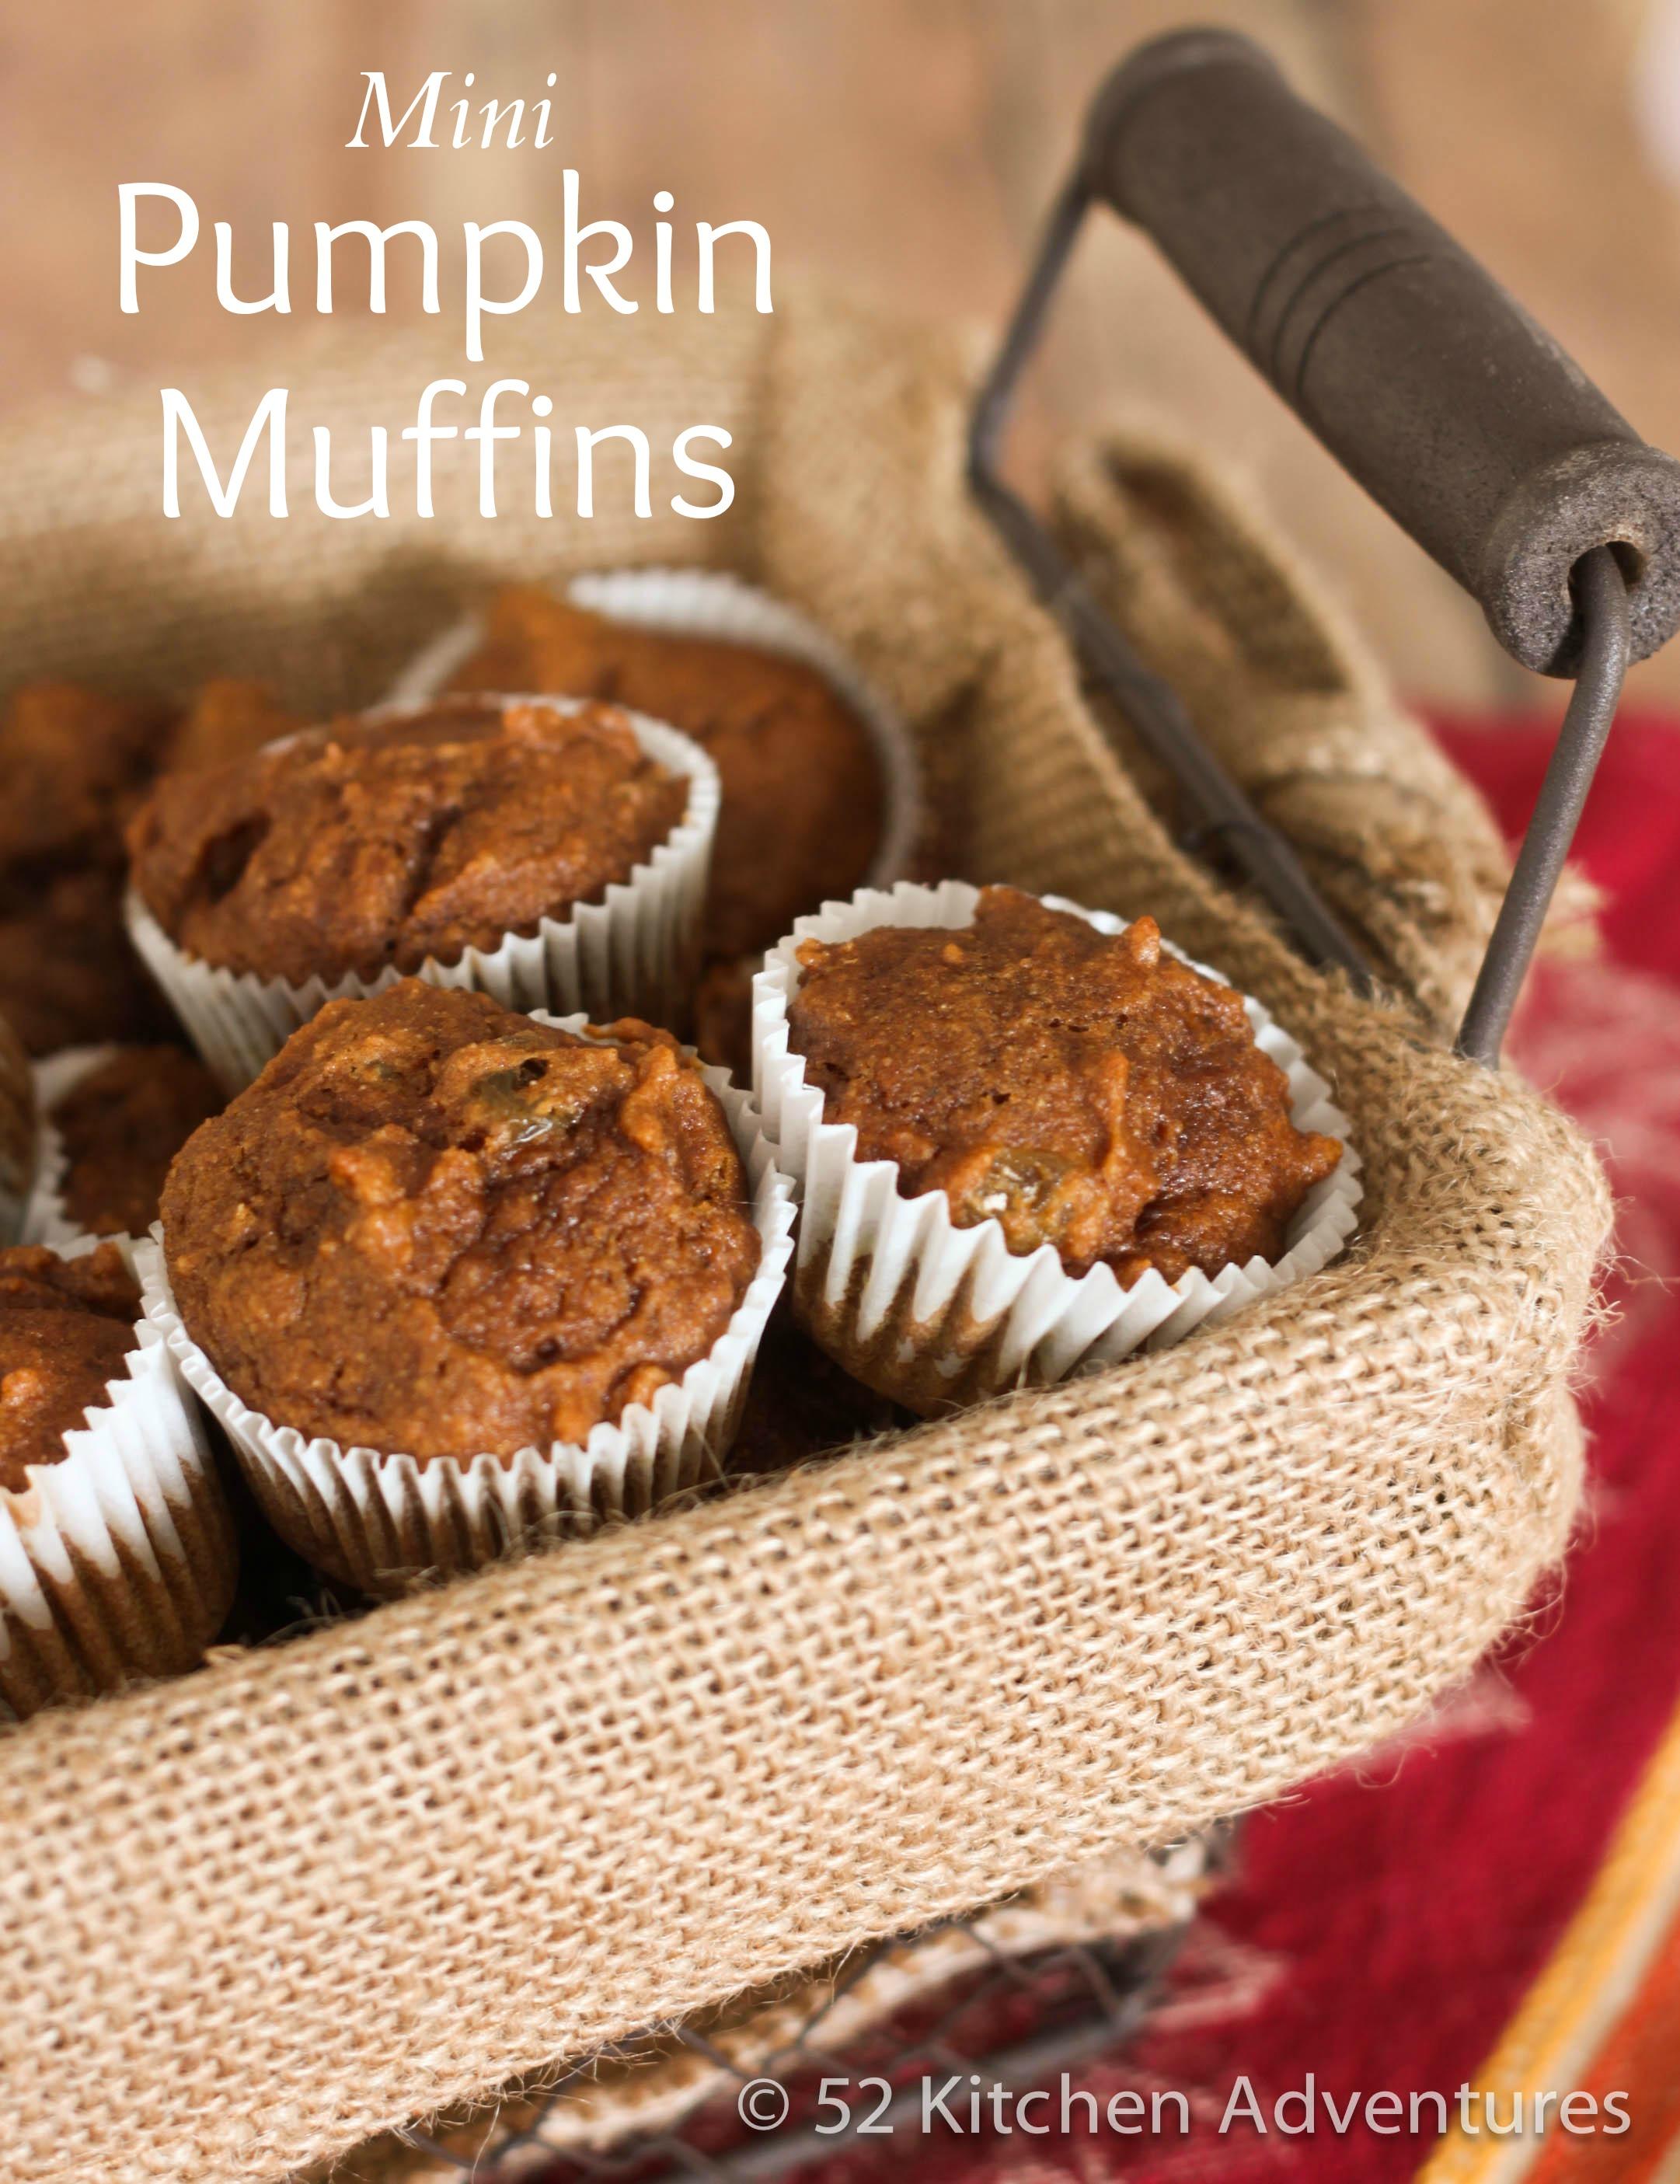 Mini Pumpkin Muffins